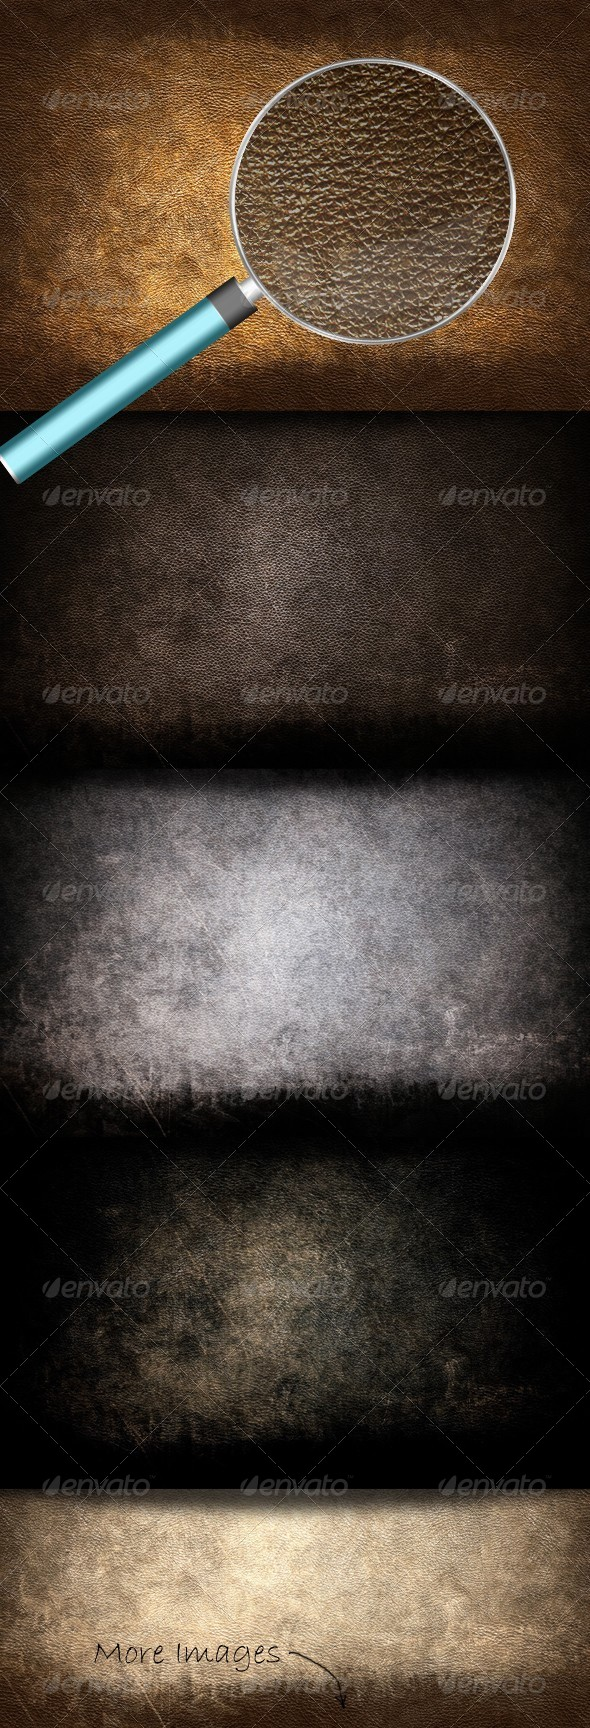 Grunge Leather Textures - Industrial / Grunge Textures